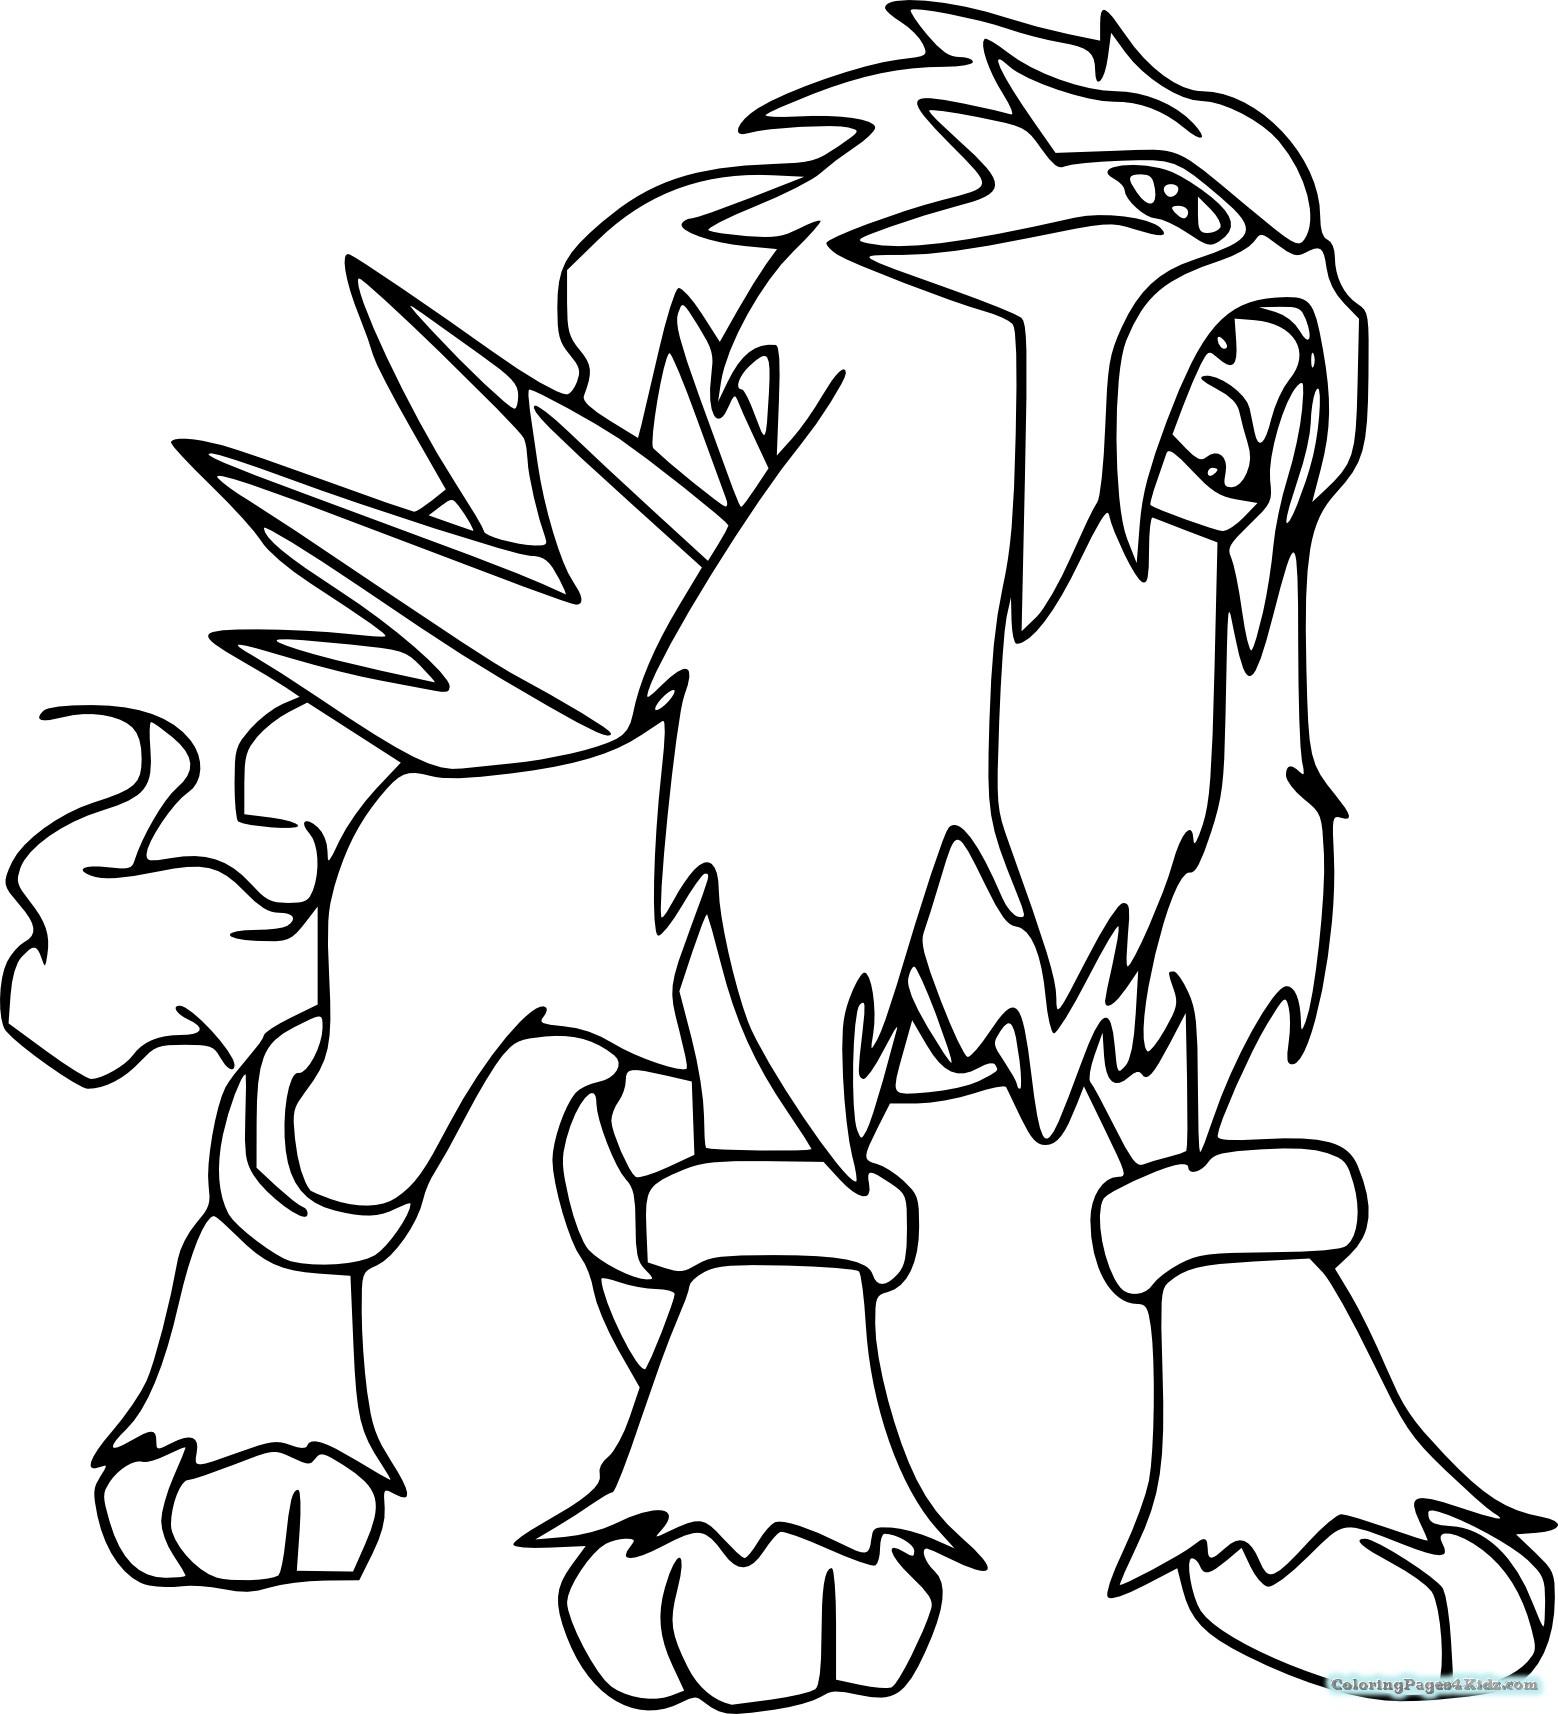 pokemon coloring page desenhos de pokemon39s para colorir desenhos para colorir coloring pokemon page